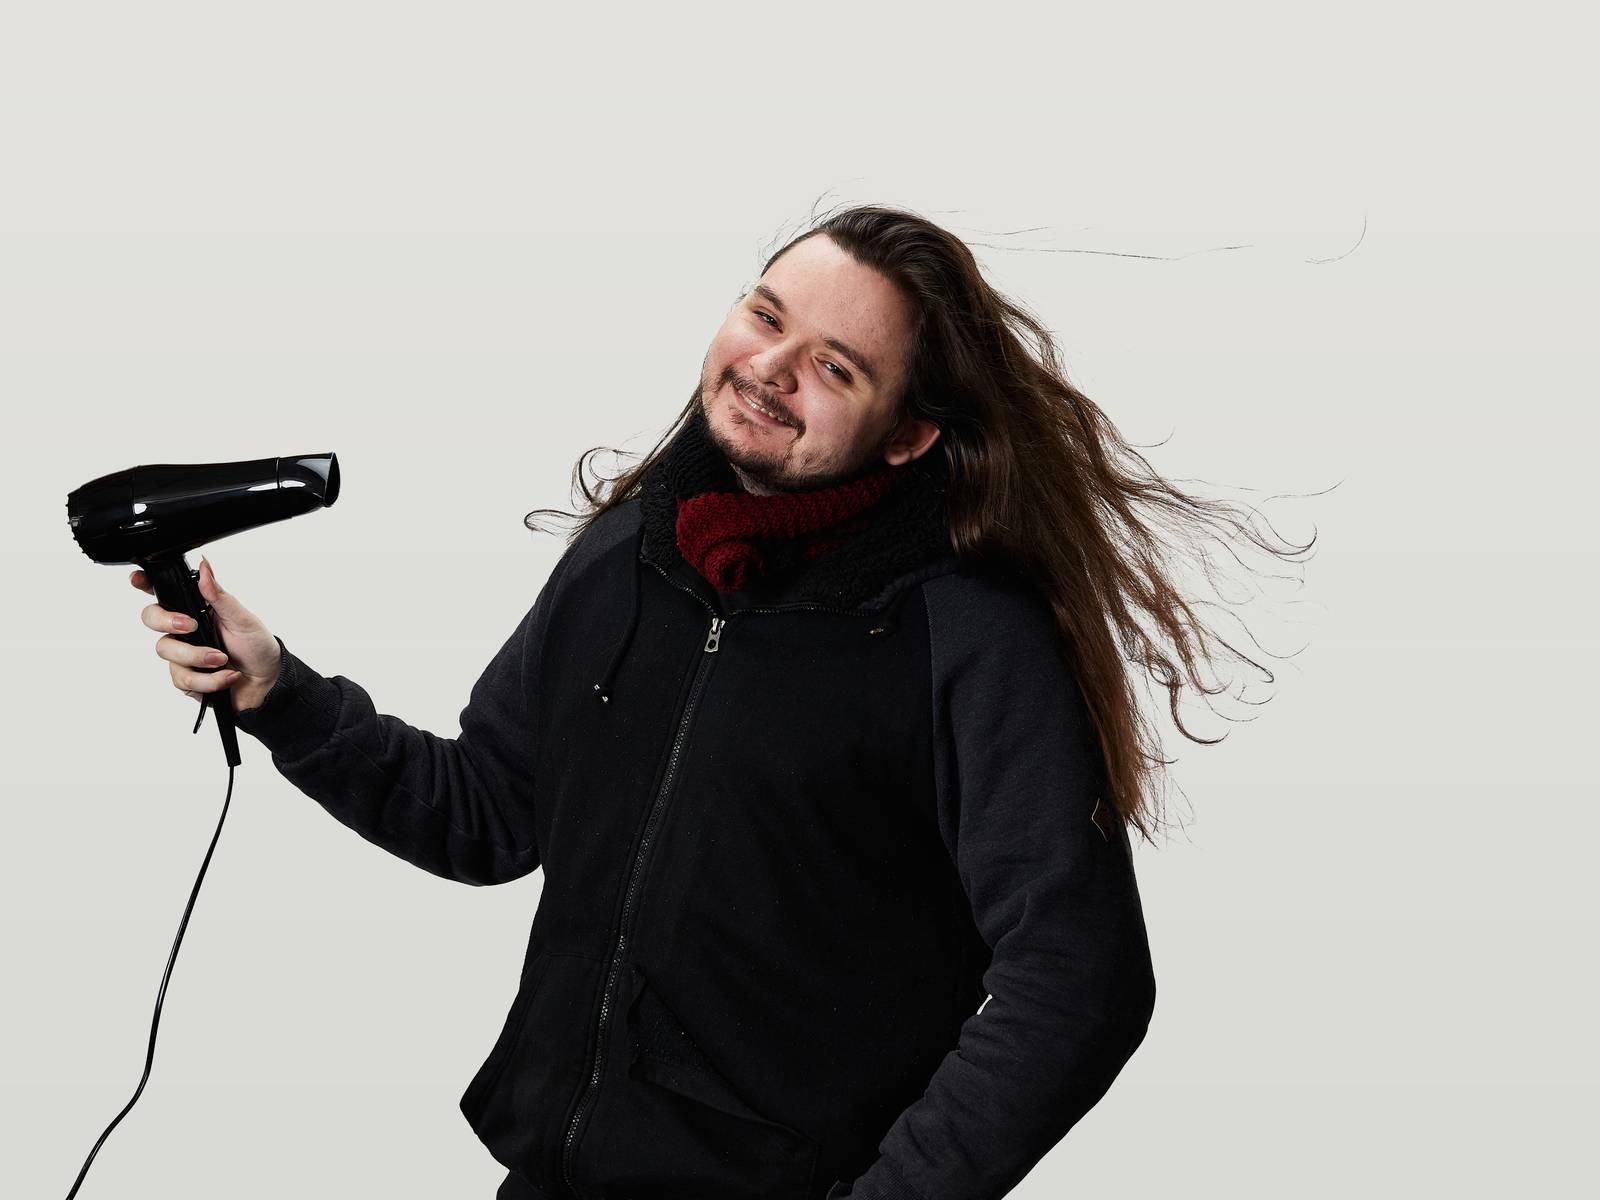 Calin blow drying his long hair